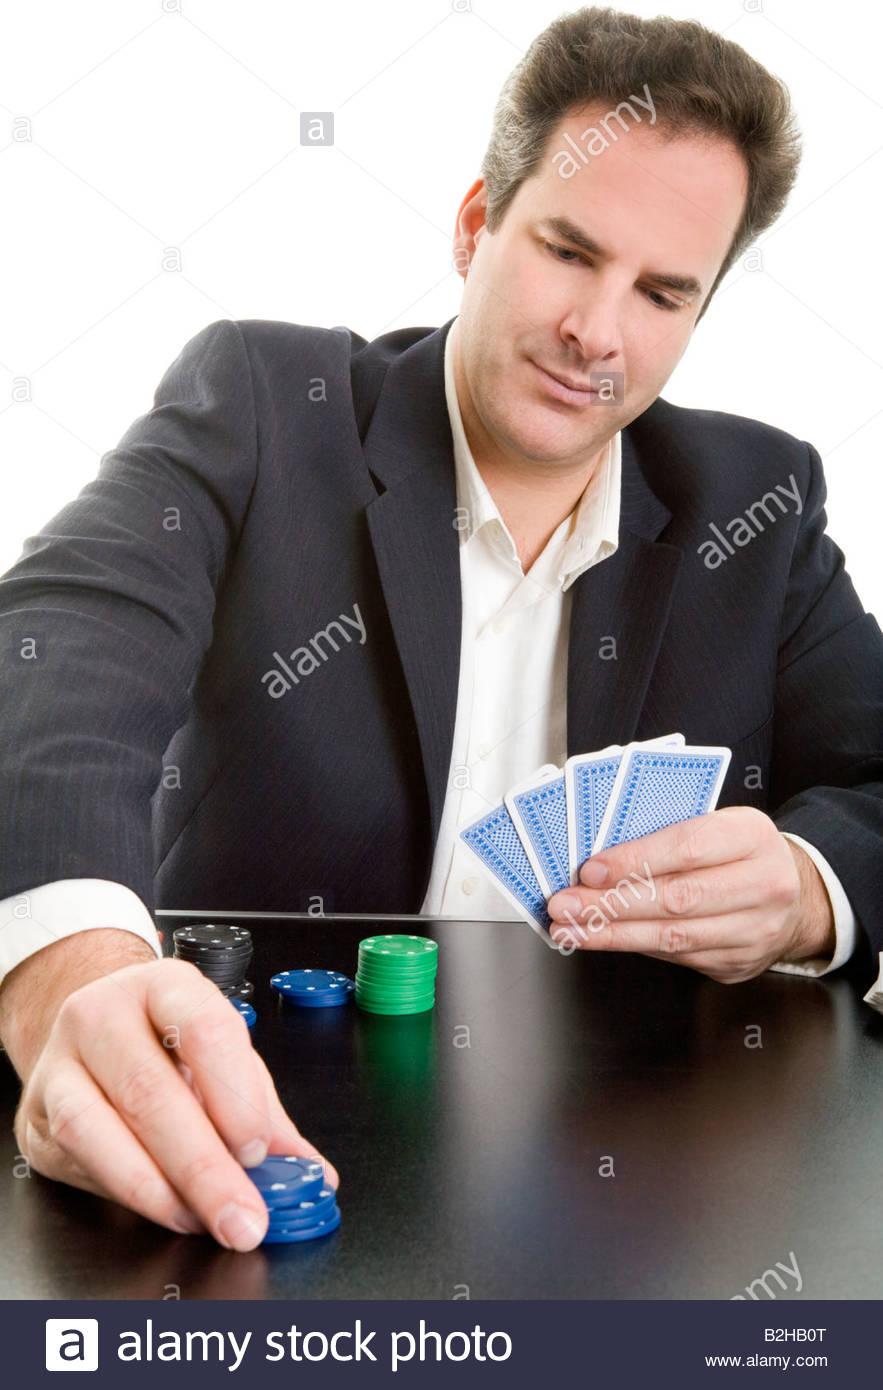 deck of cards gambling game poker chips winnings triumph gainings gambler  businessman salesman tradesman shirt collar manager